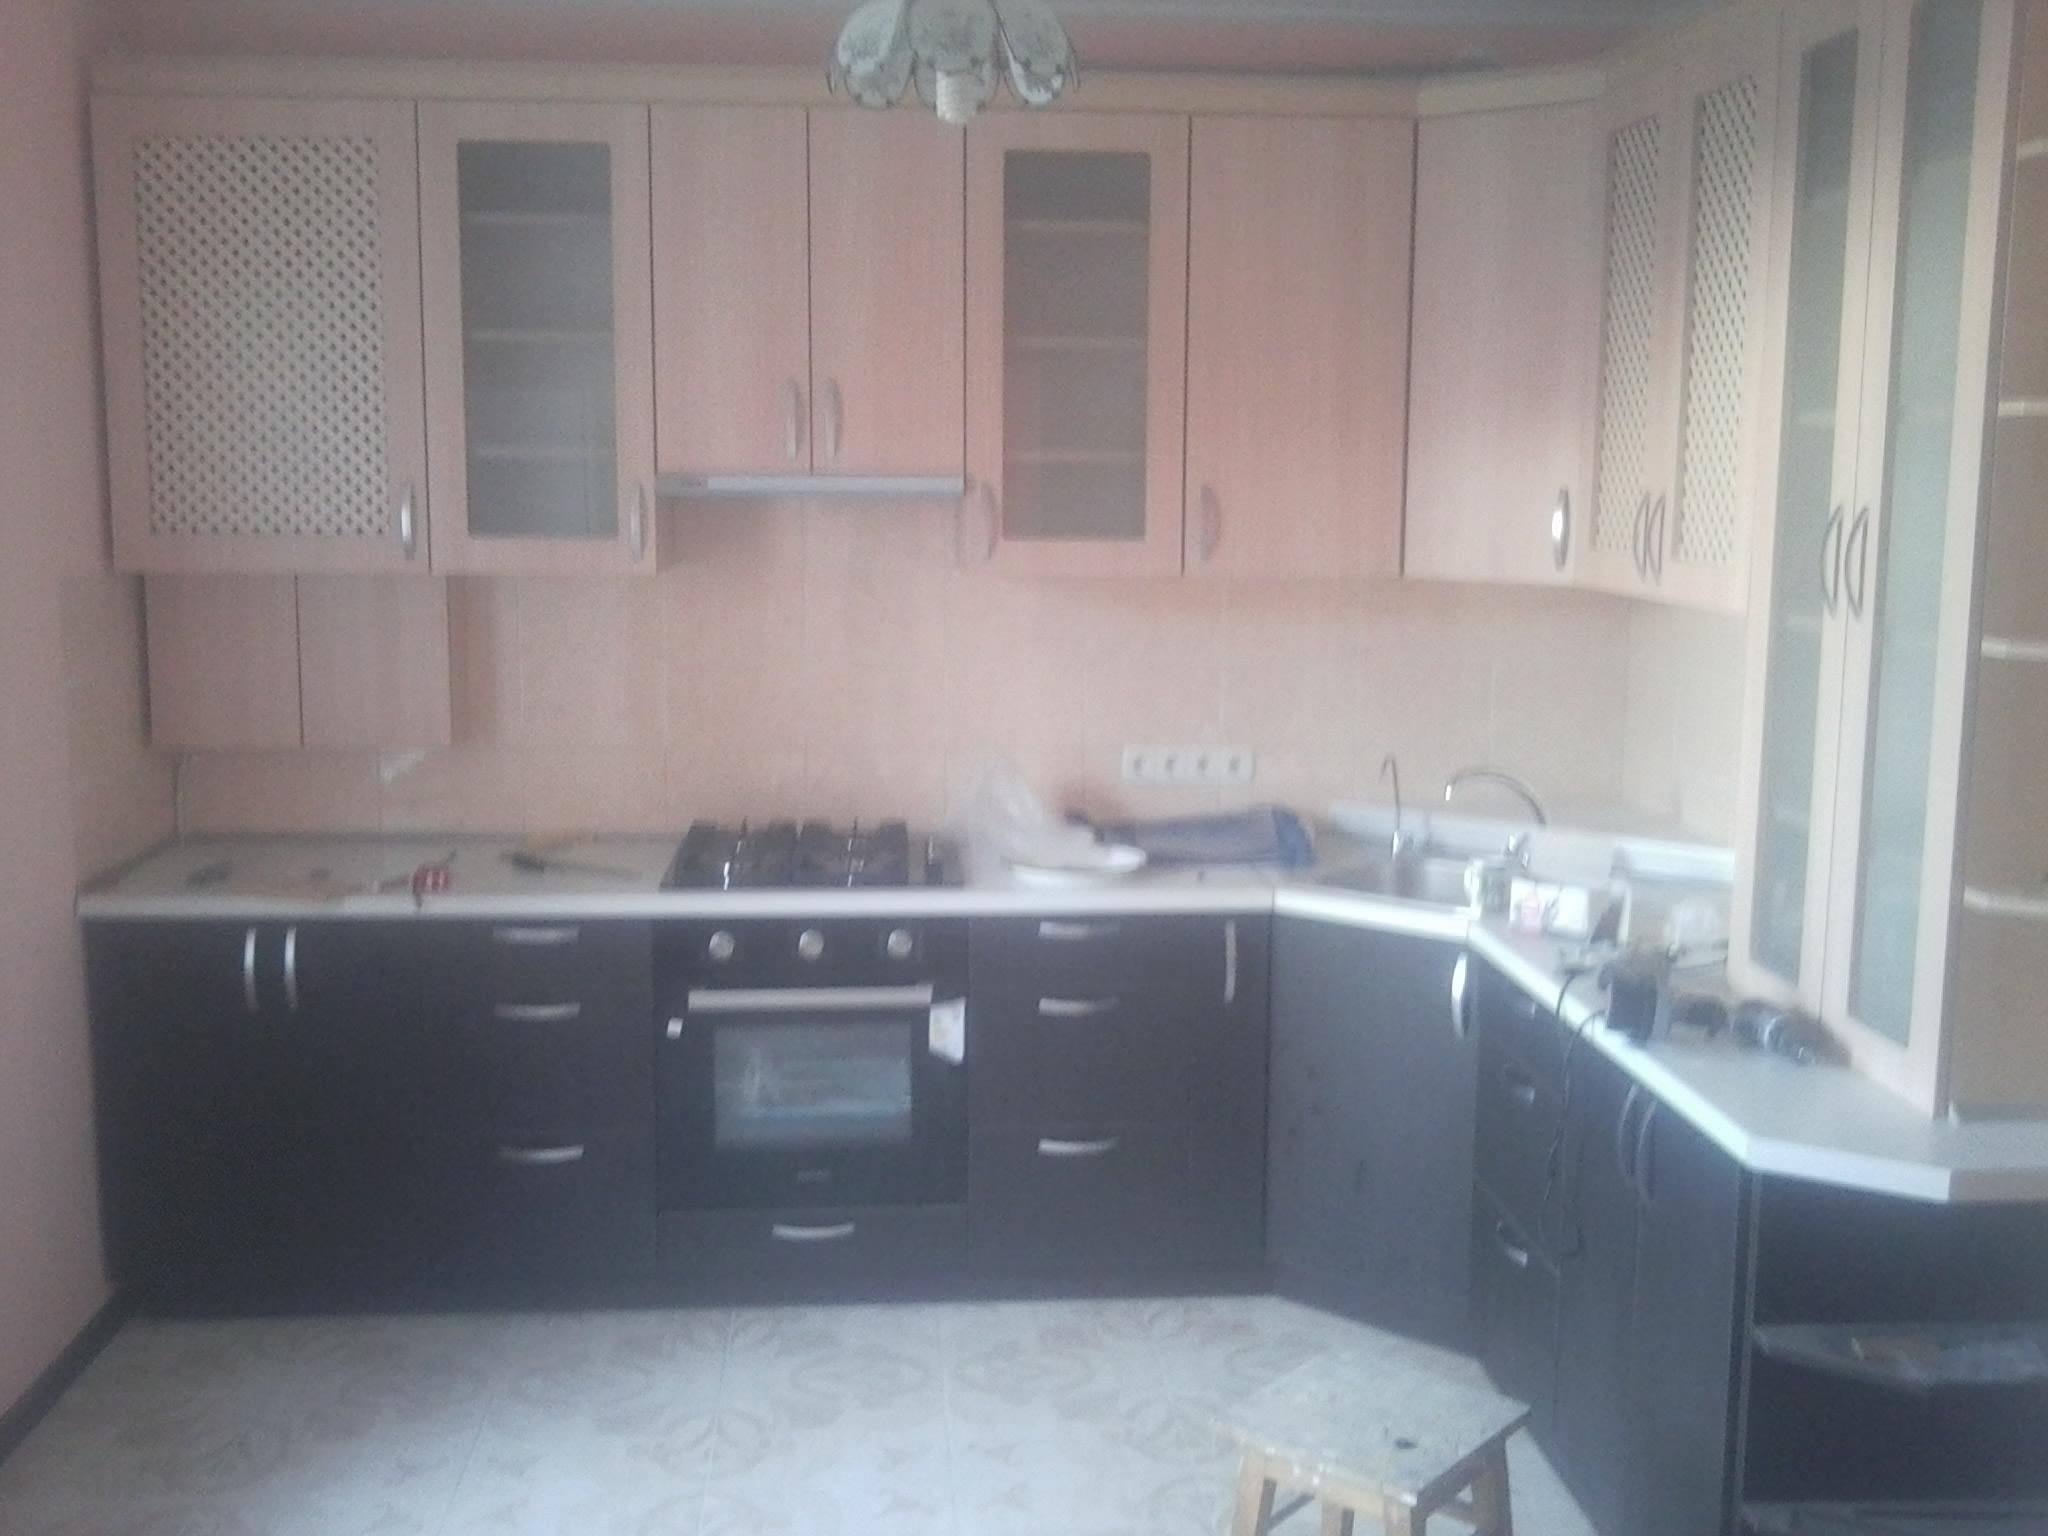 5,5 метров кухни с фасадами МДФ пластик melaton за 134 тыс. рублей